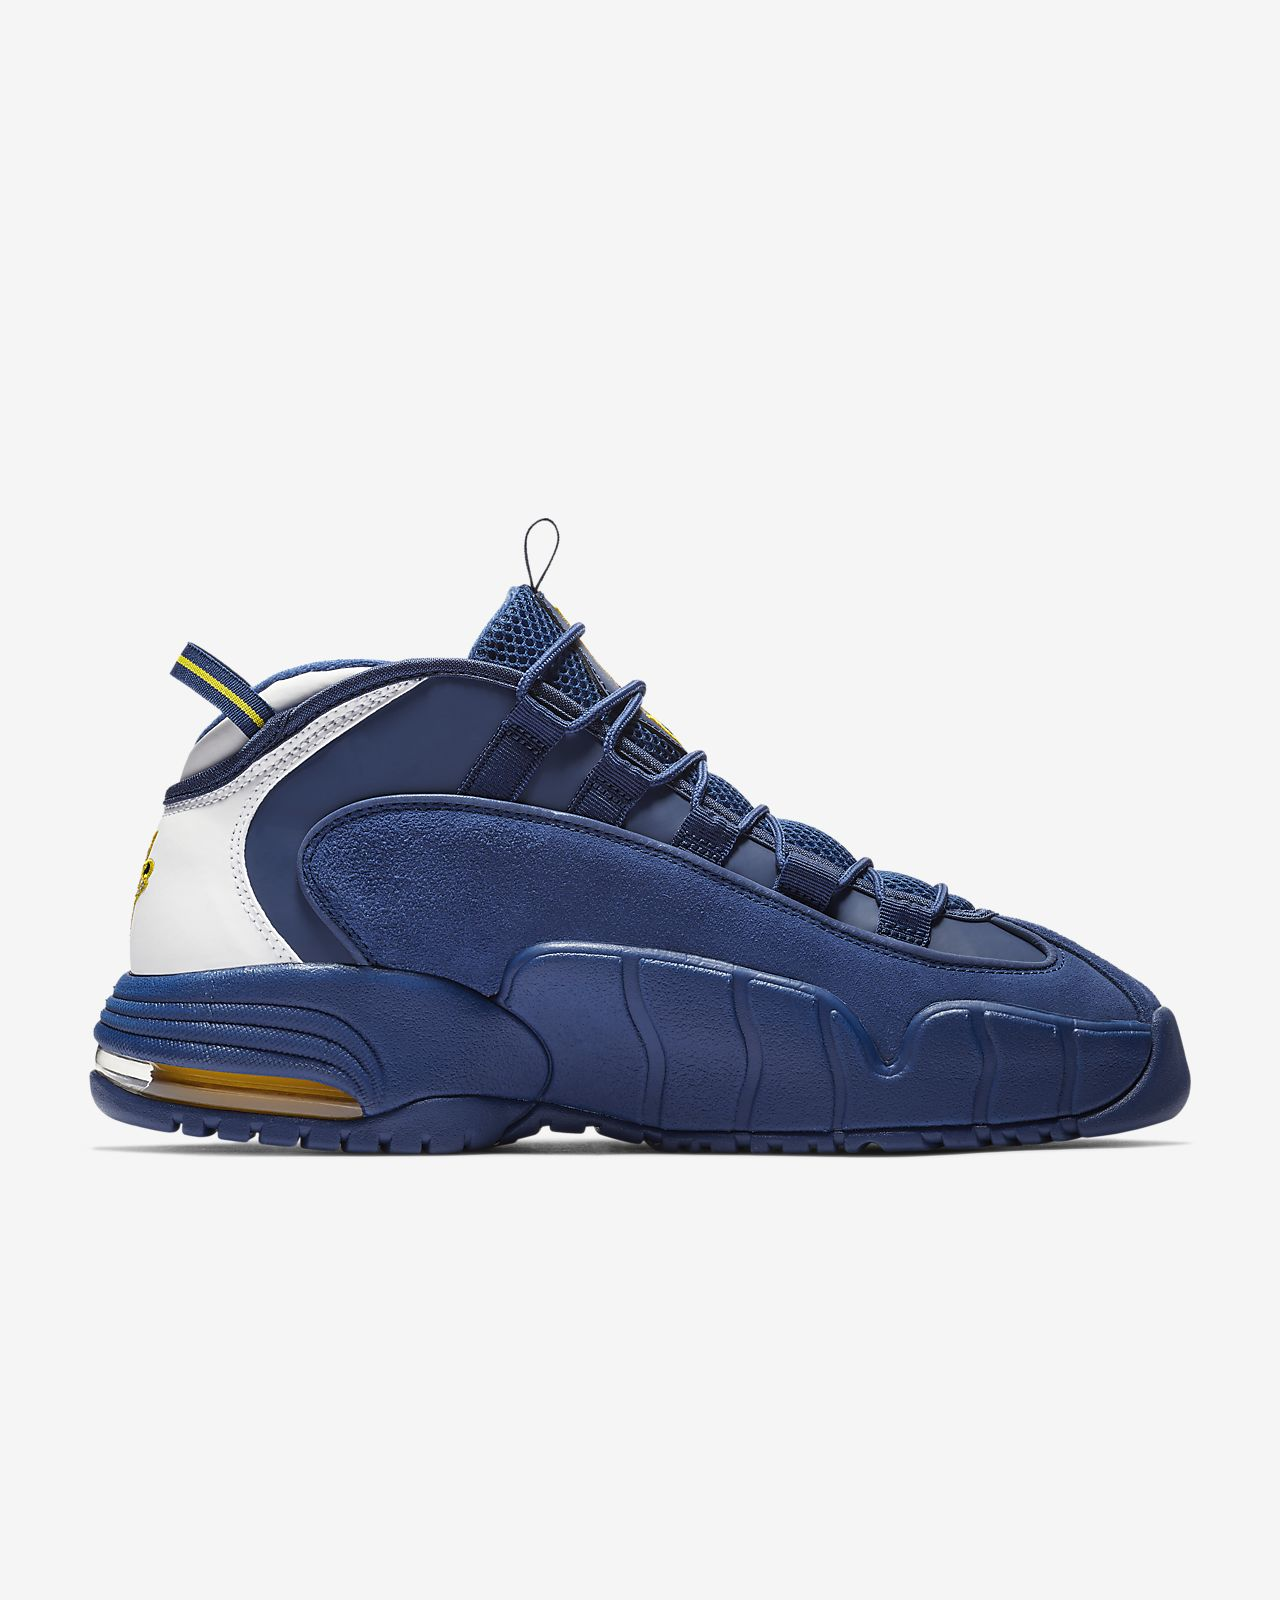 new concept b076c 09043 ... Nike Air Max Penny Men s Shoe